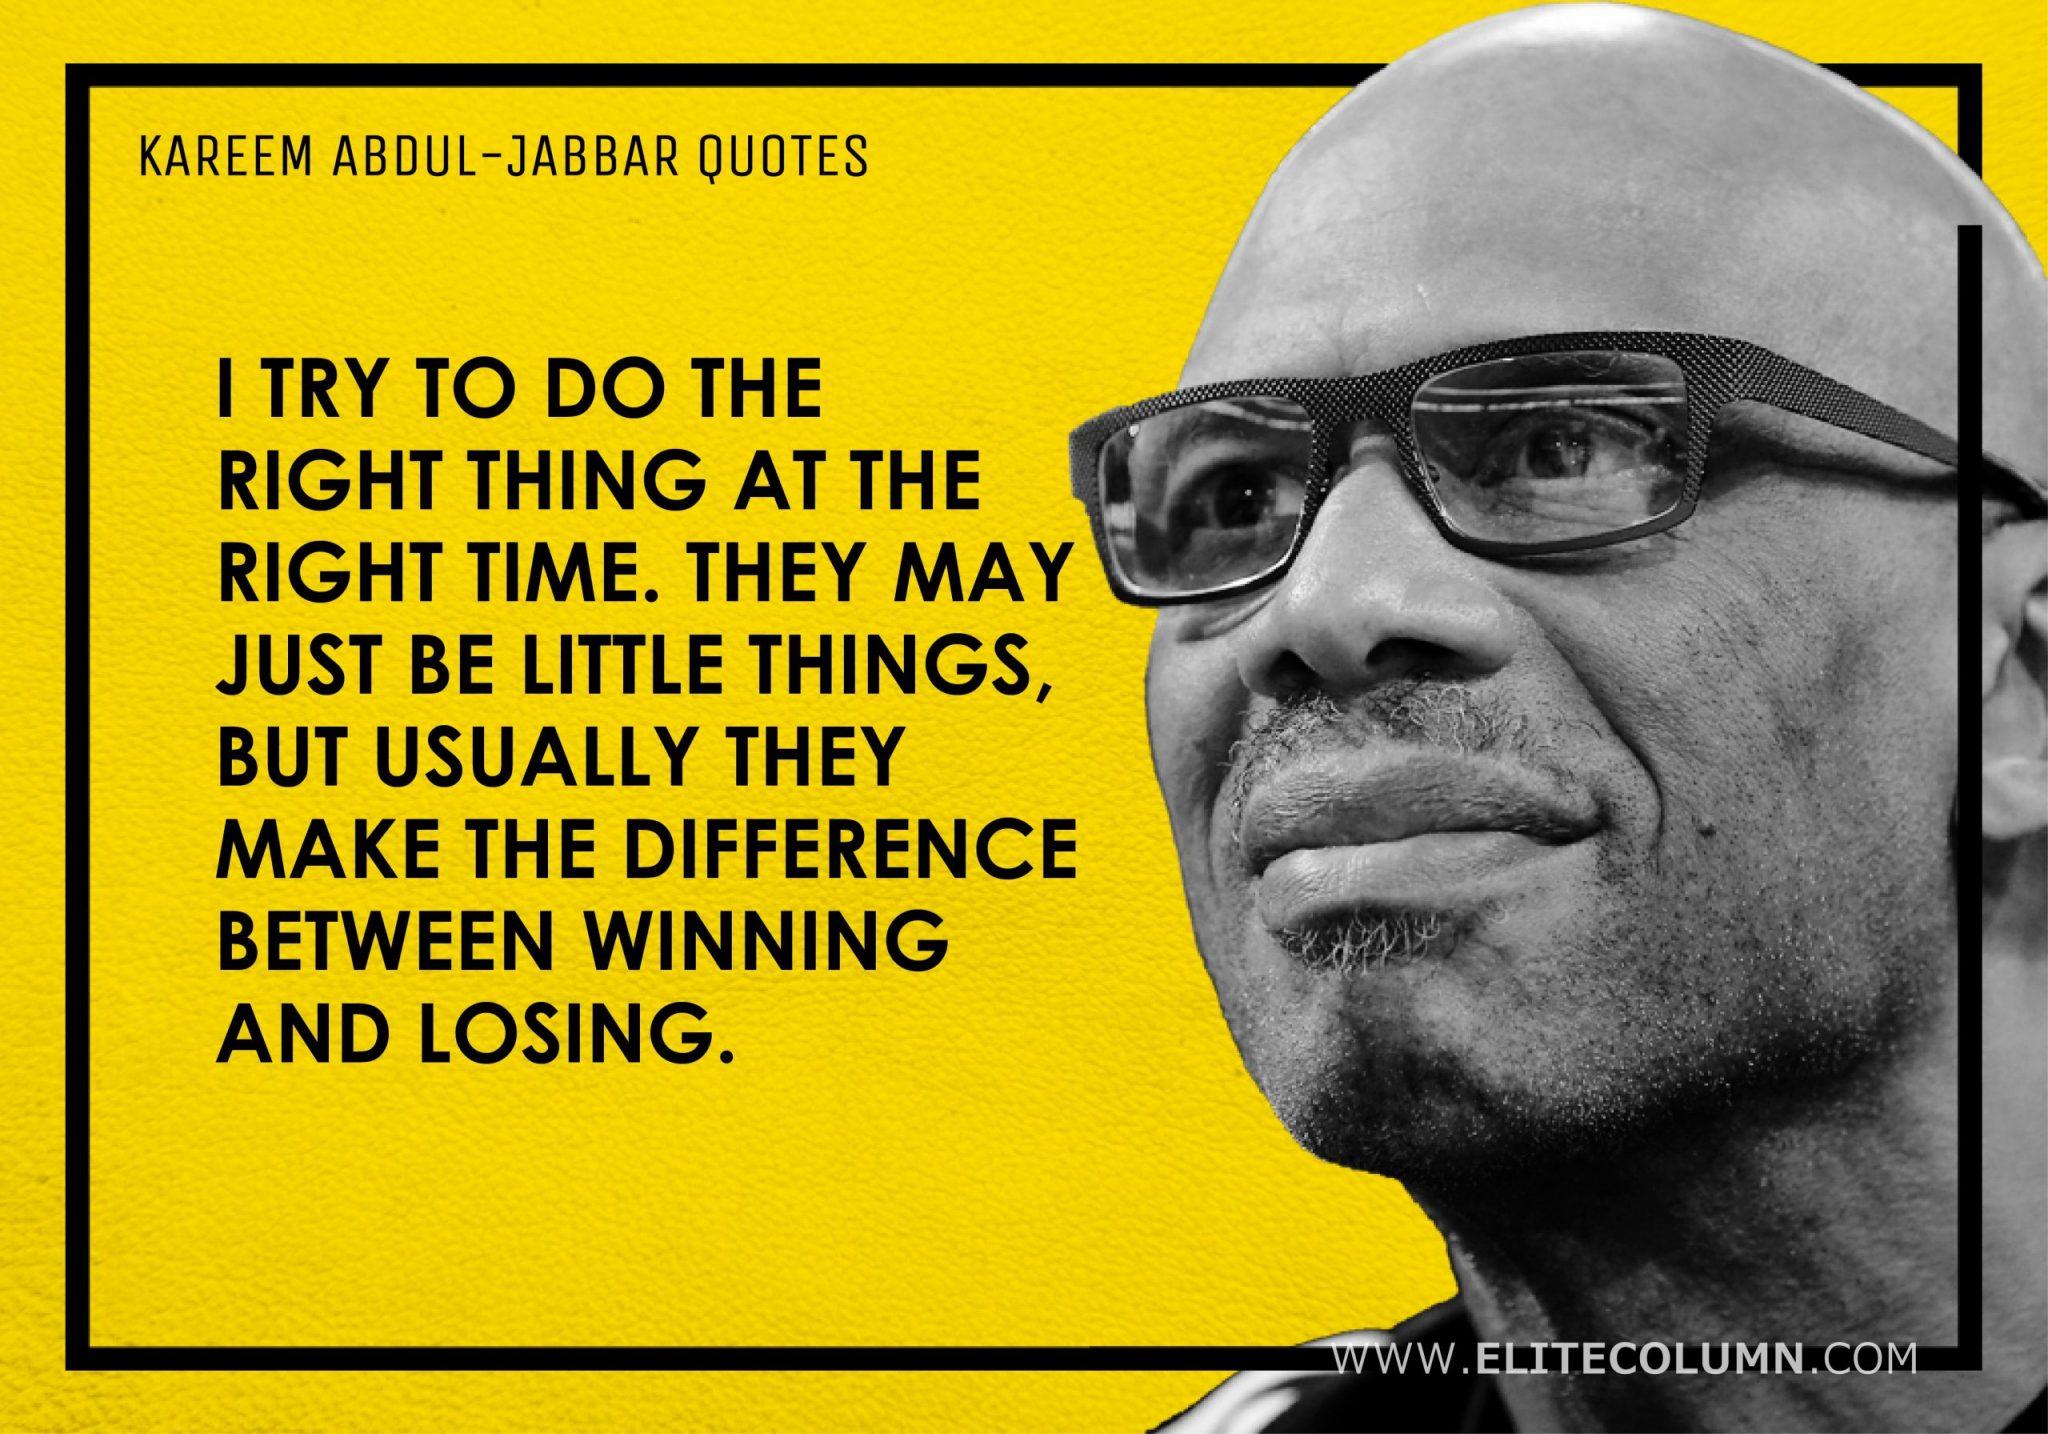 Kareem Abdul-Jabbar Quotes (12)